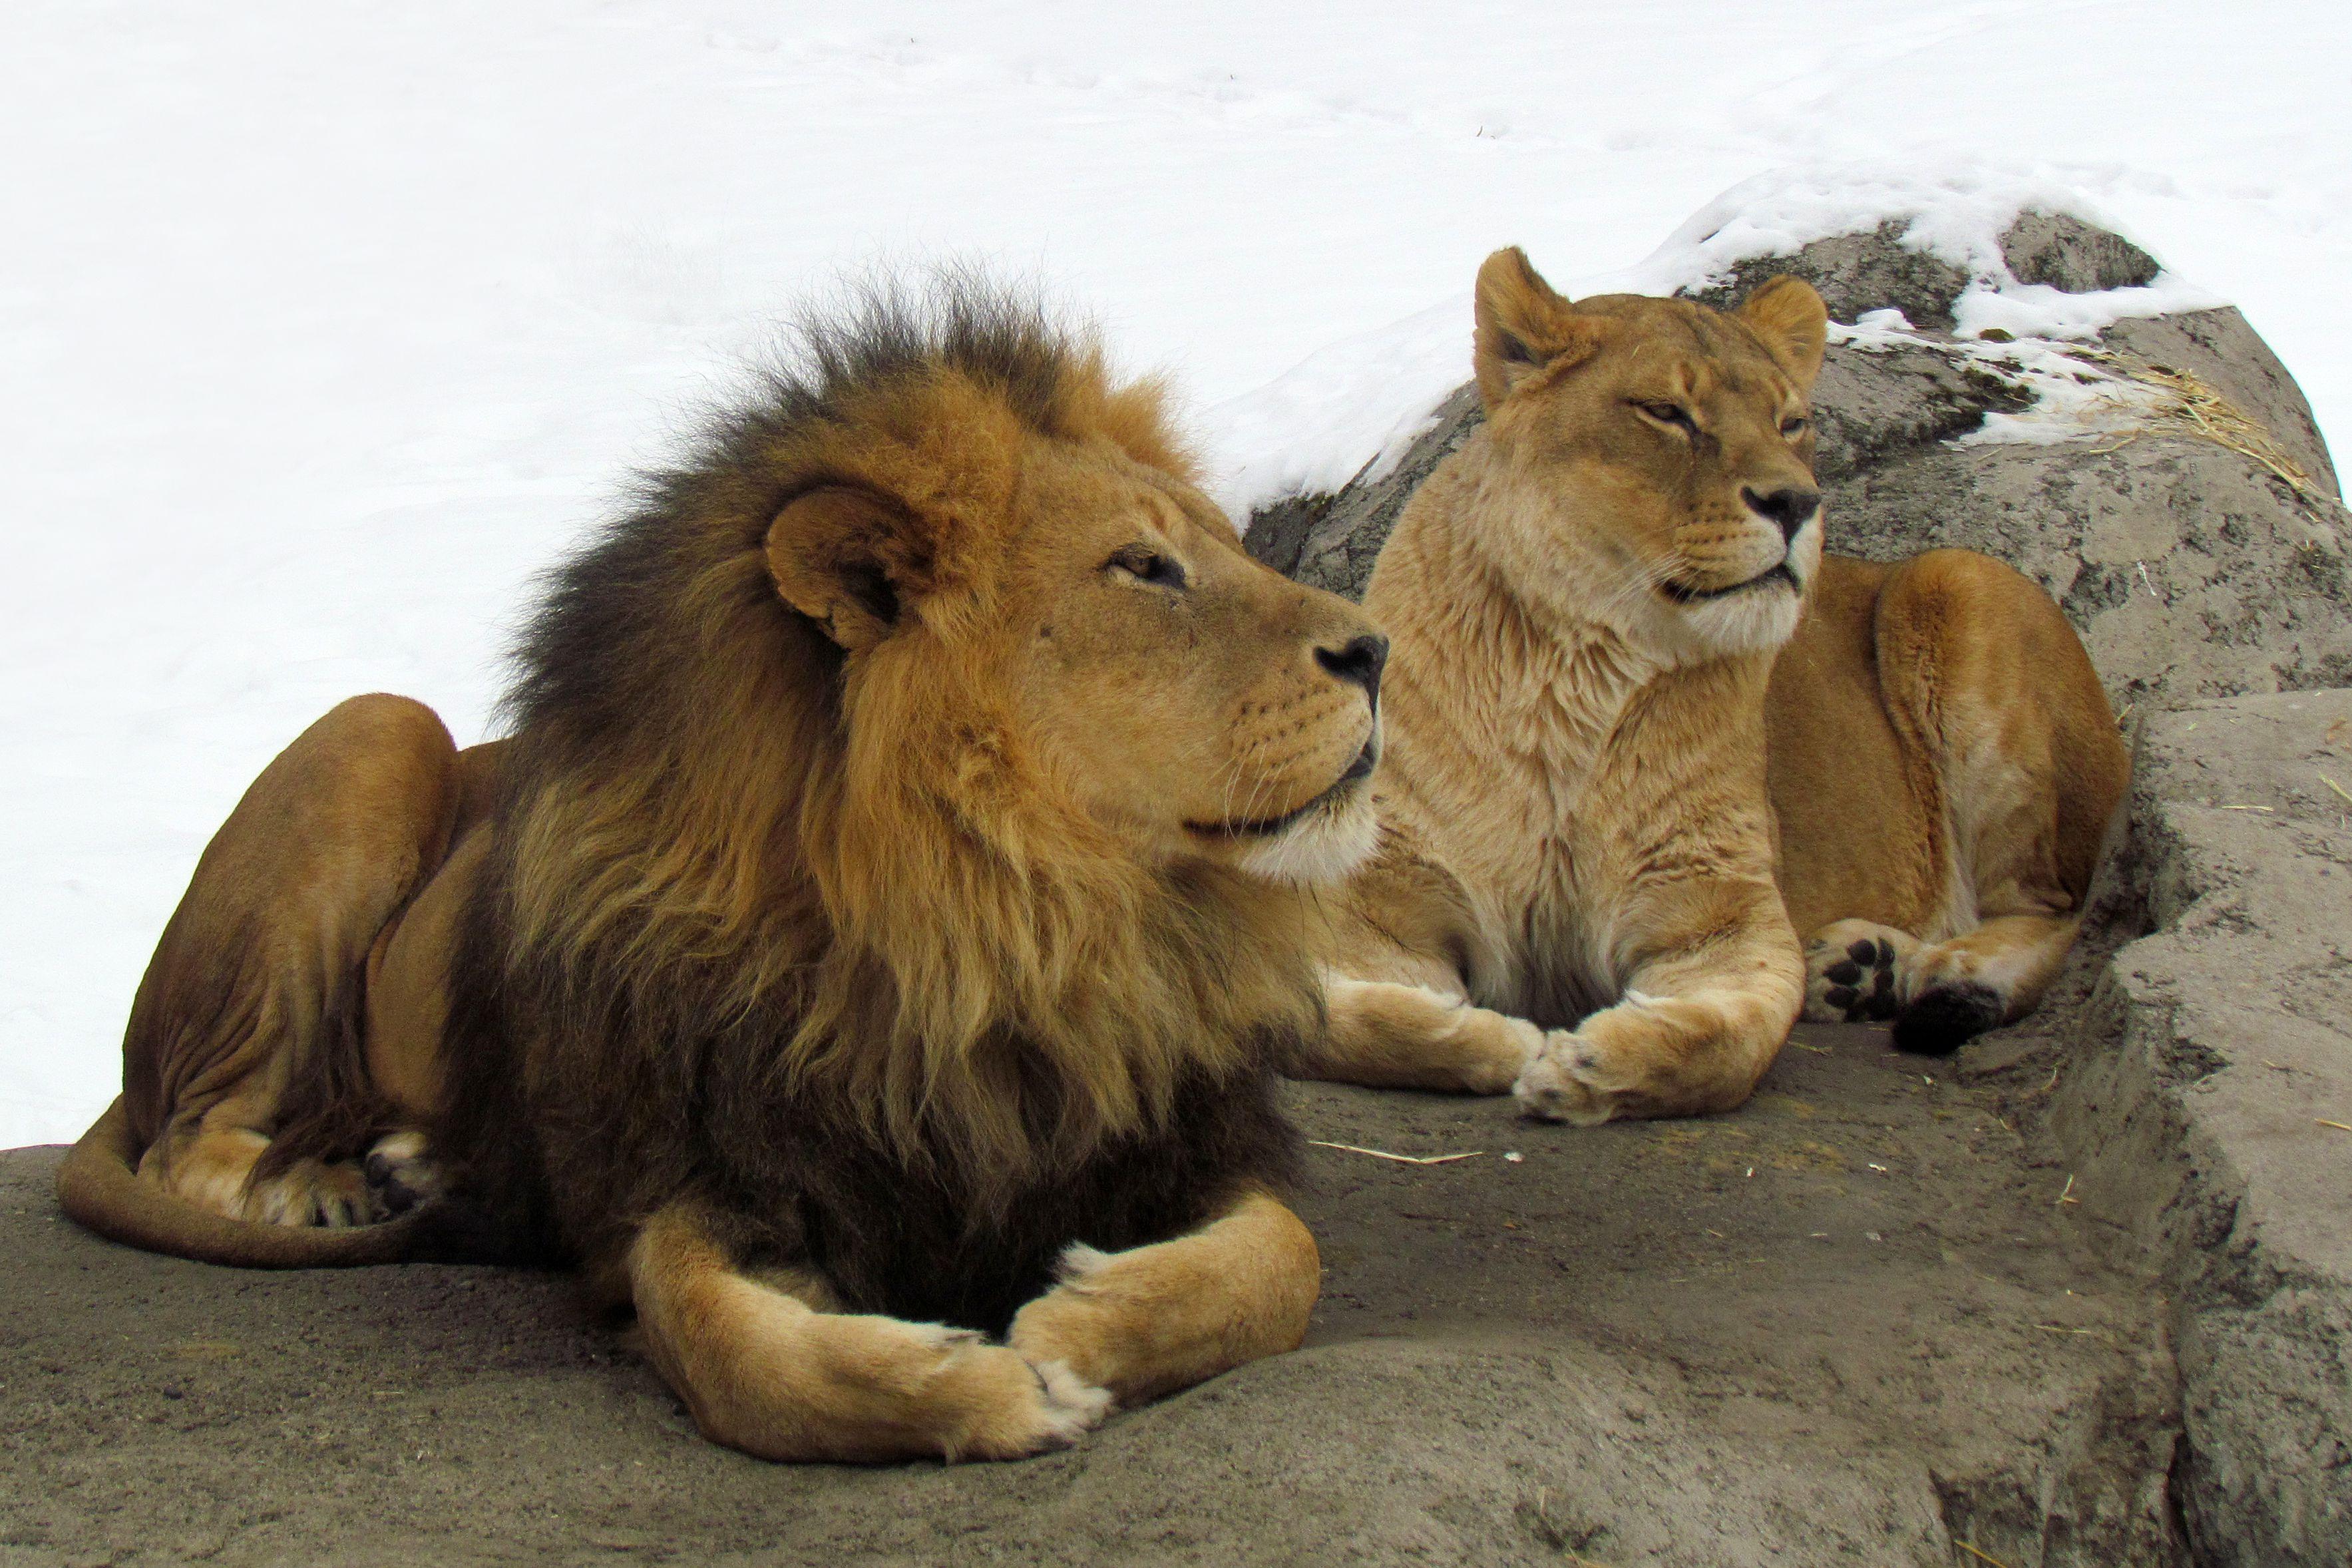 Pair of lions at Calgary Zoo